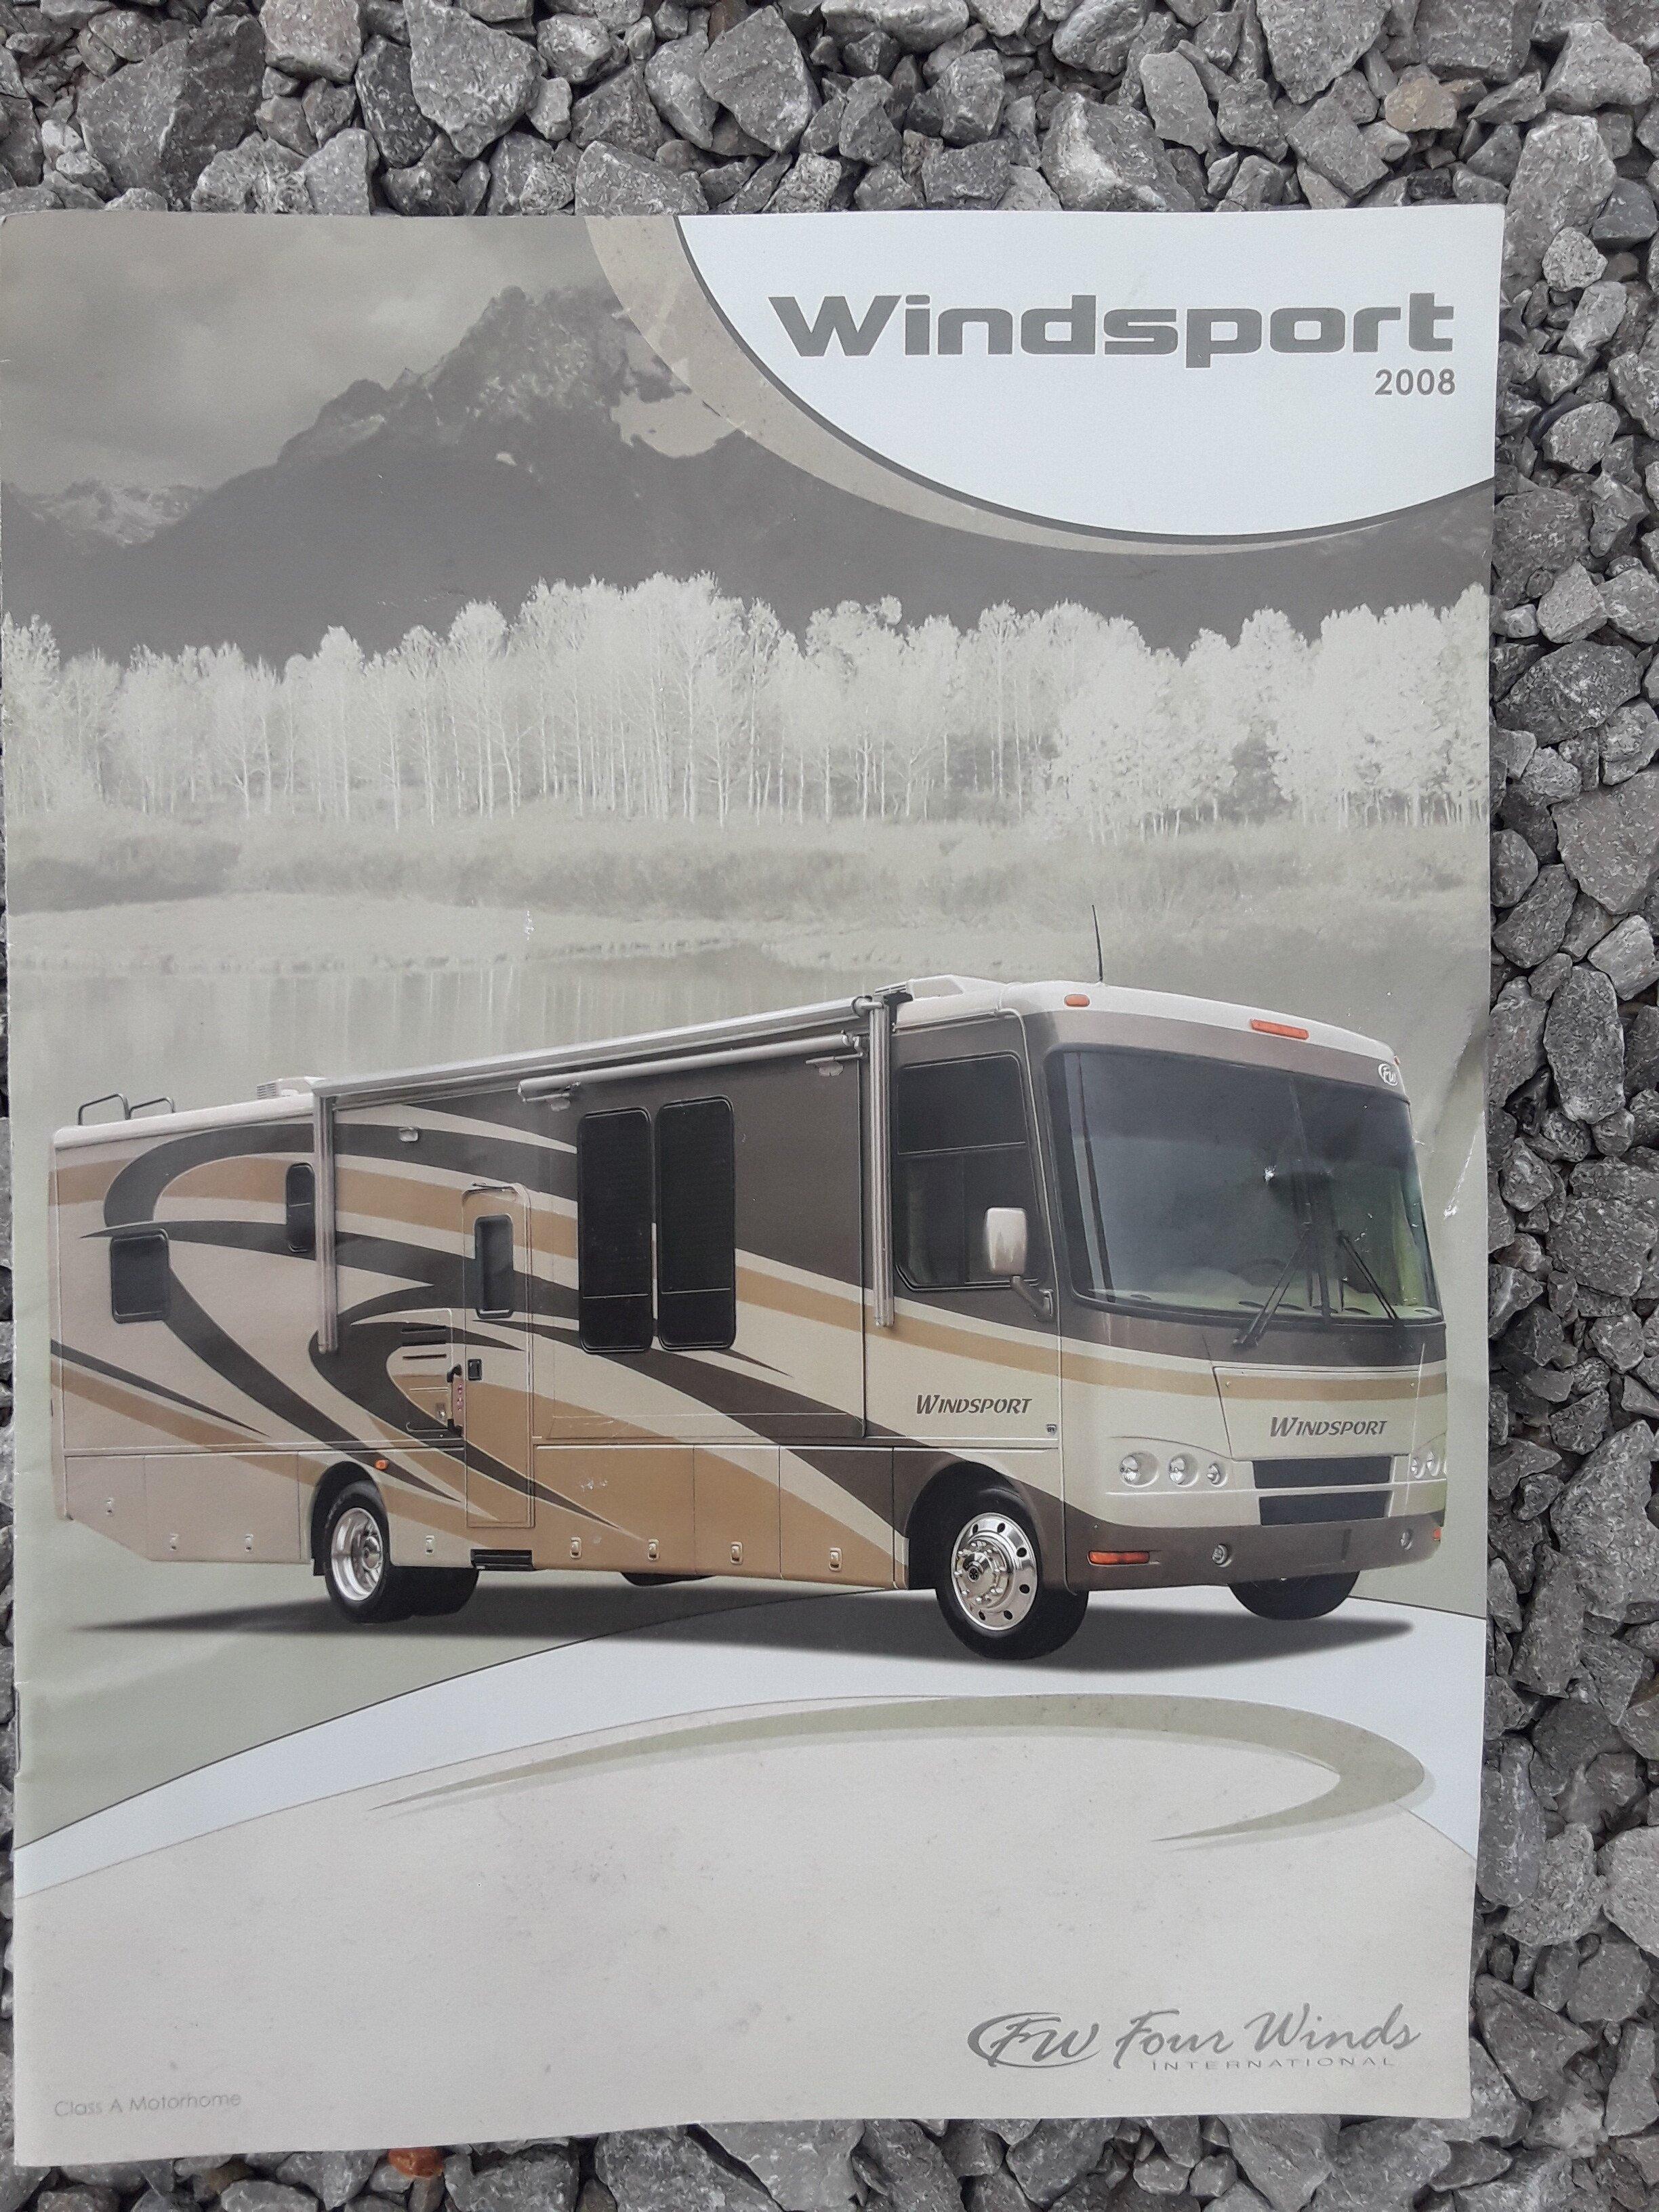 Thor Windsport Rvs For Sale On Autotrader Motorhome Wiring Diagram